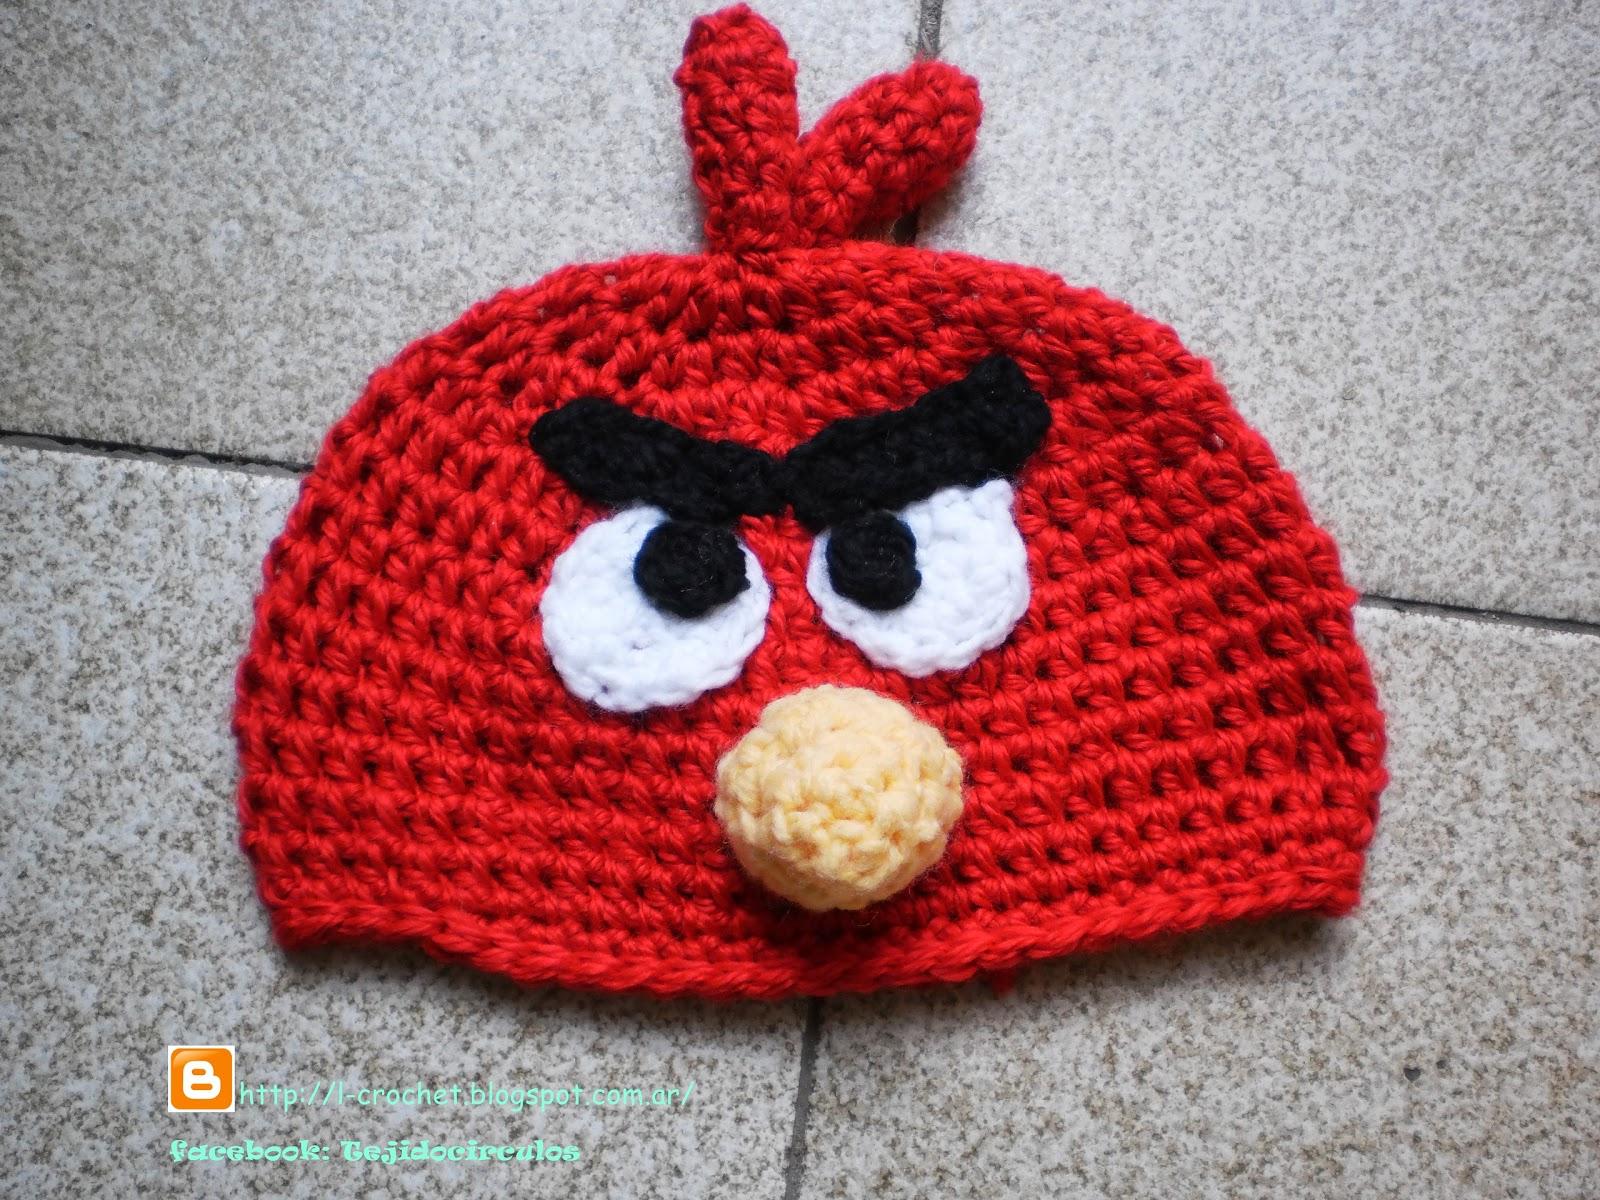 Gorros para niños a crochet - Imagui